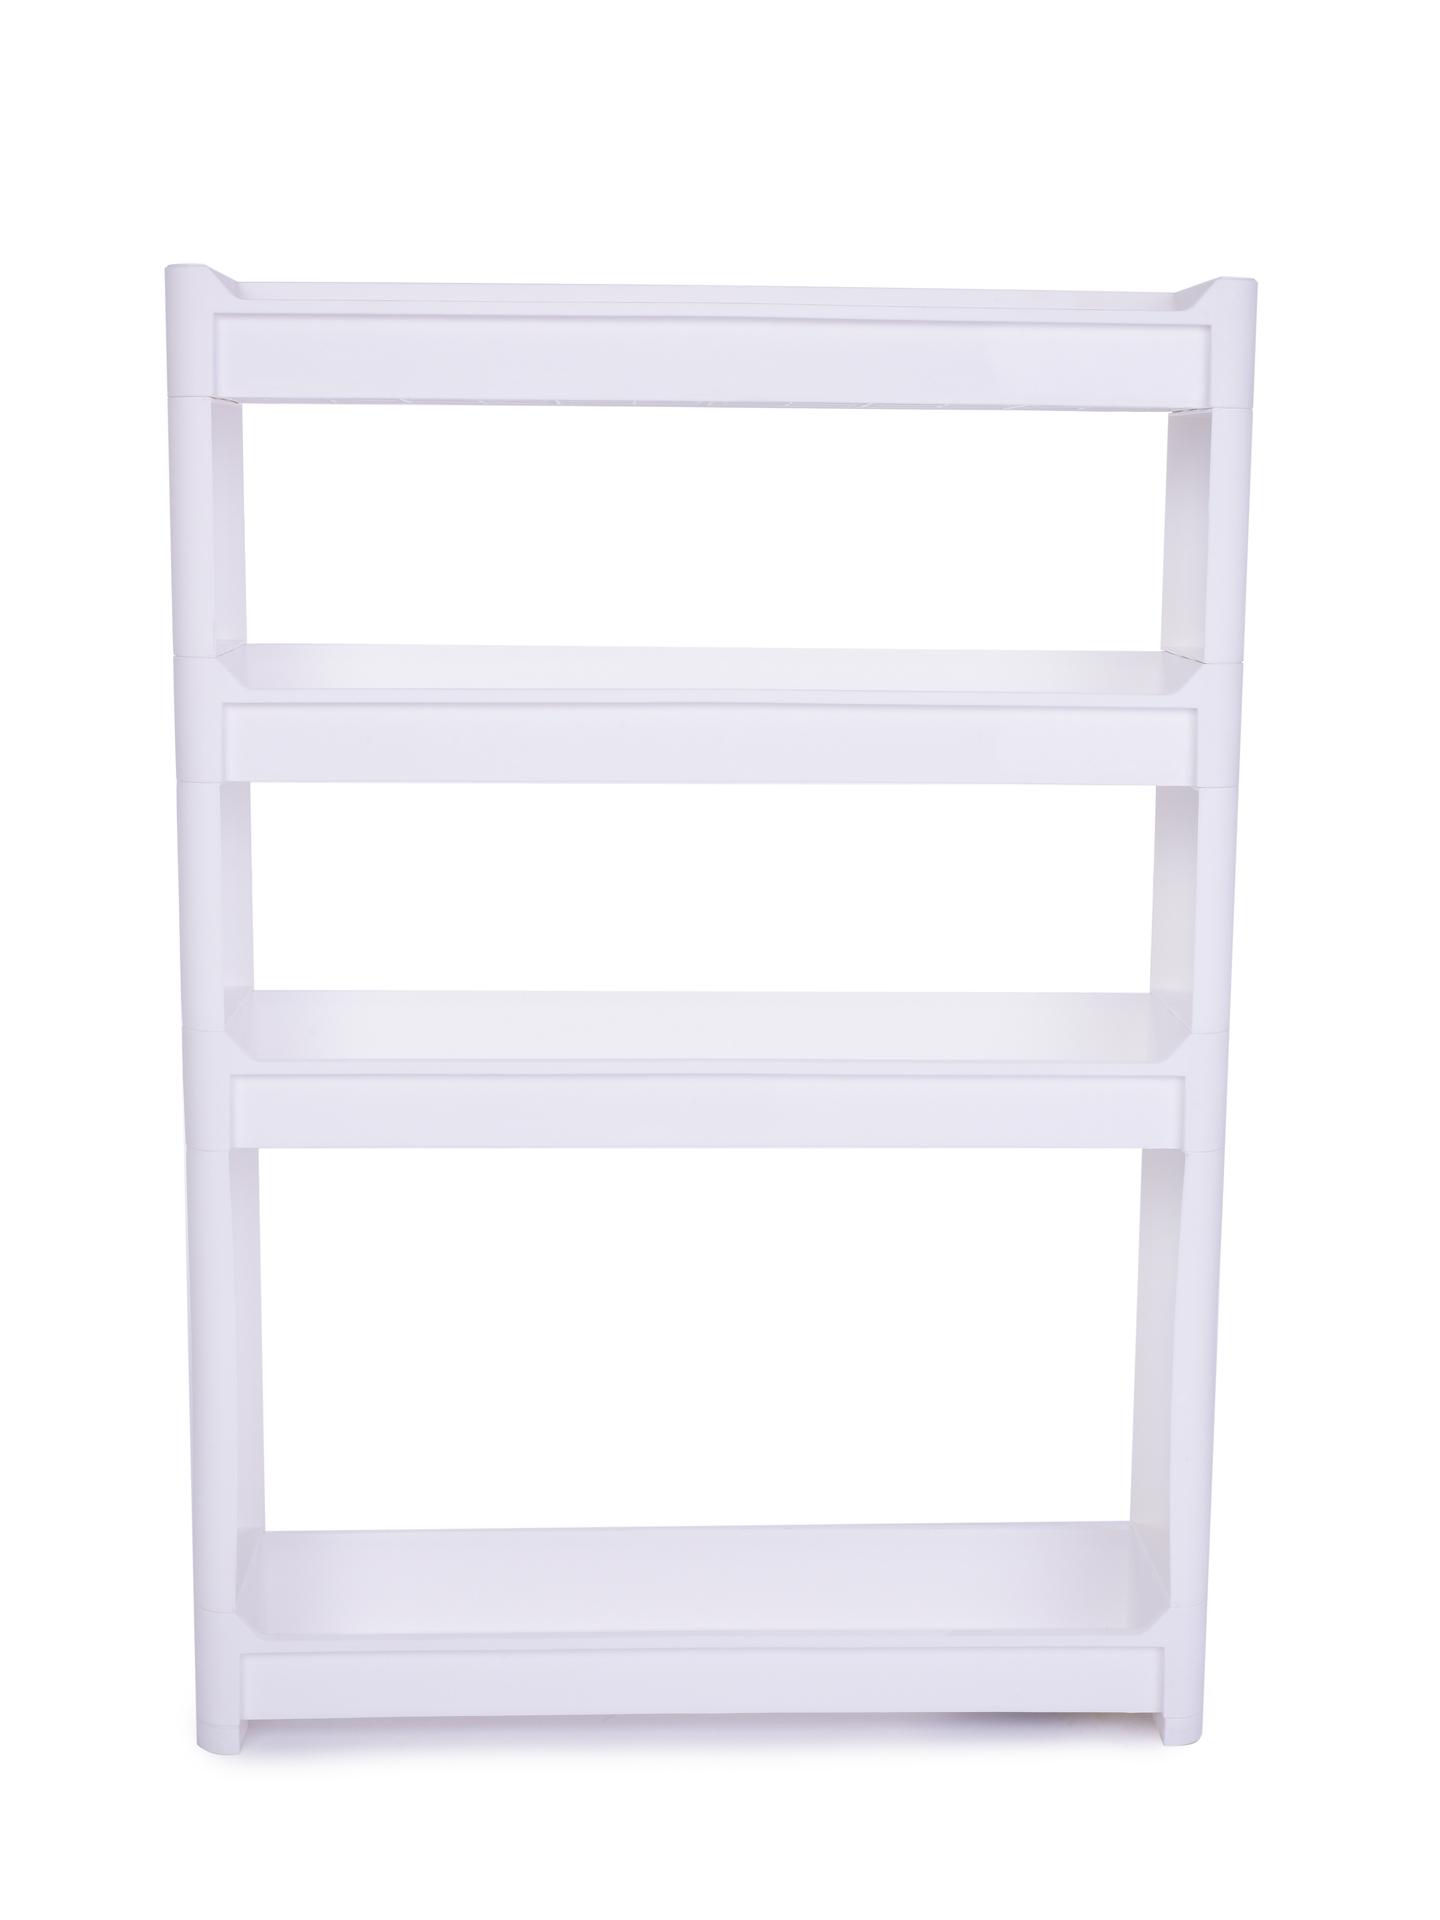 Pojízdný regál SLIM WHITE 11,5 cm do úzkých prostor, 4 patrový